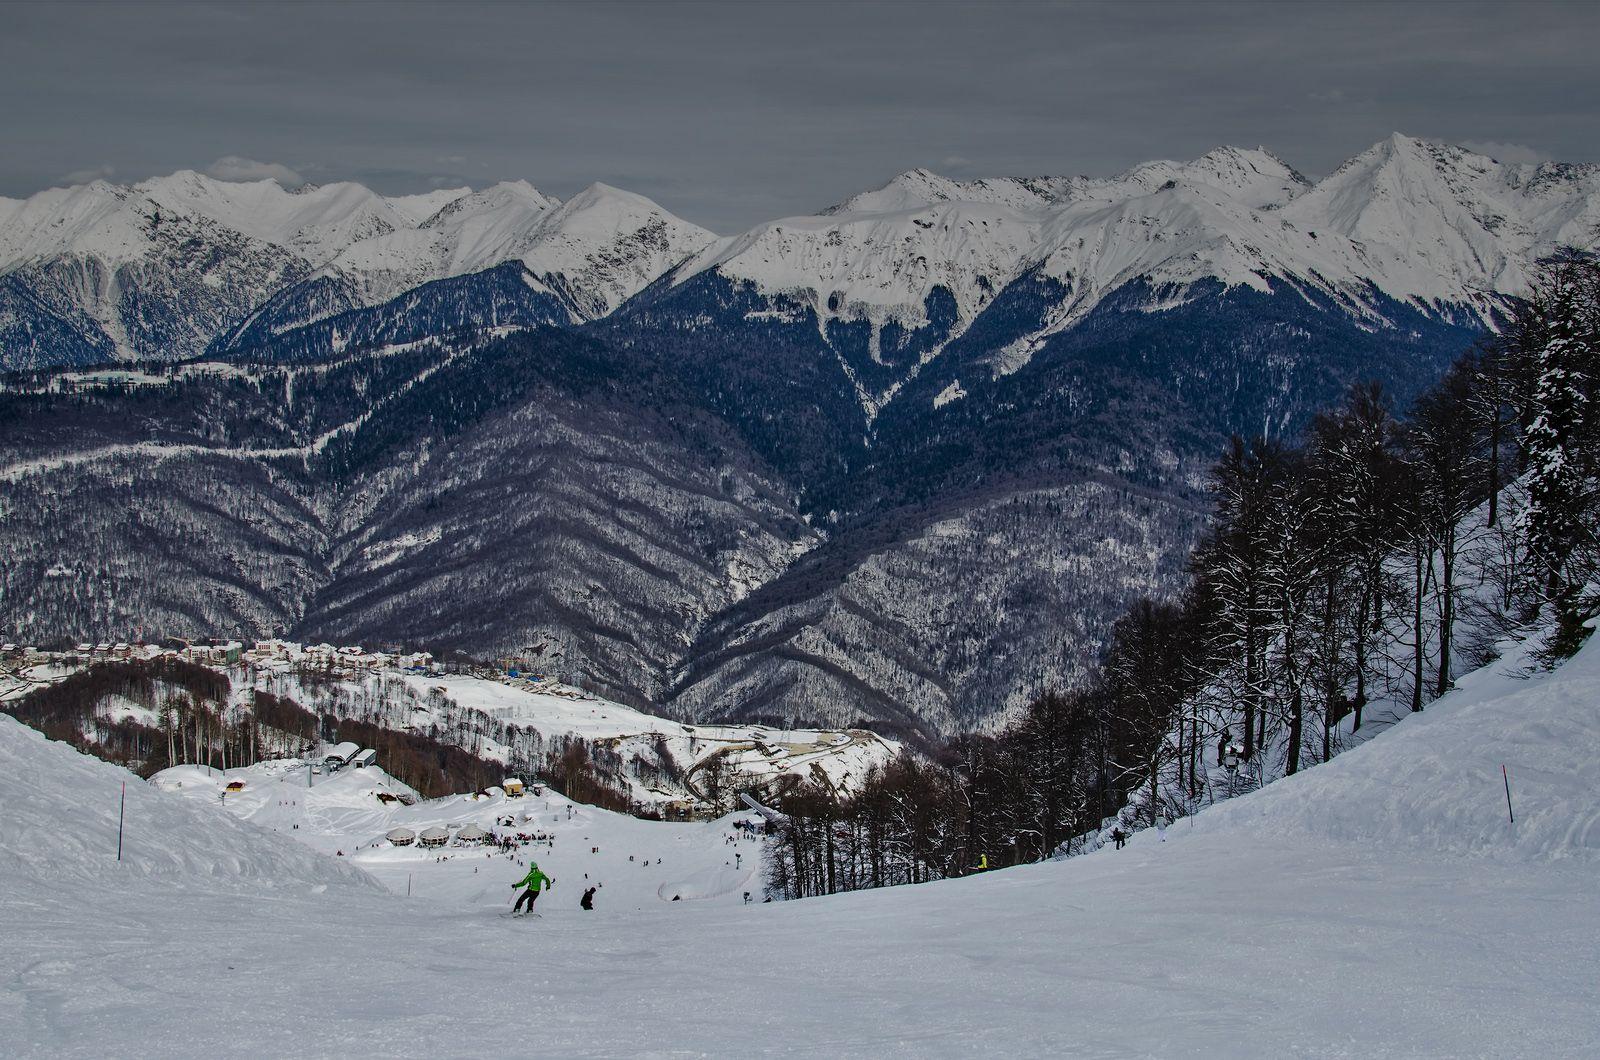 The Sochi Winter Olympics